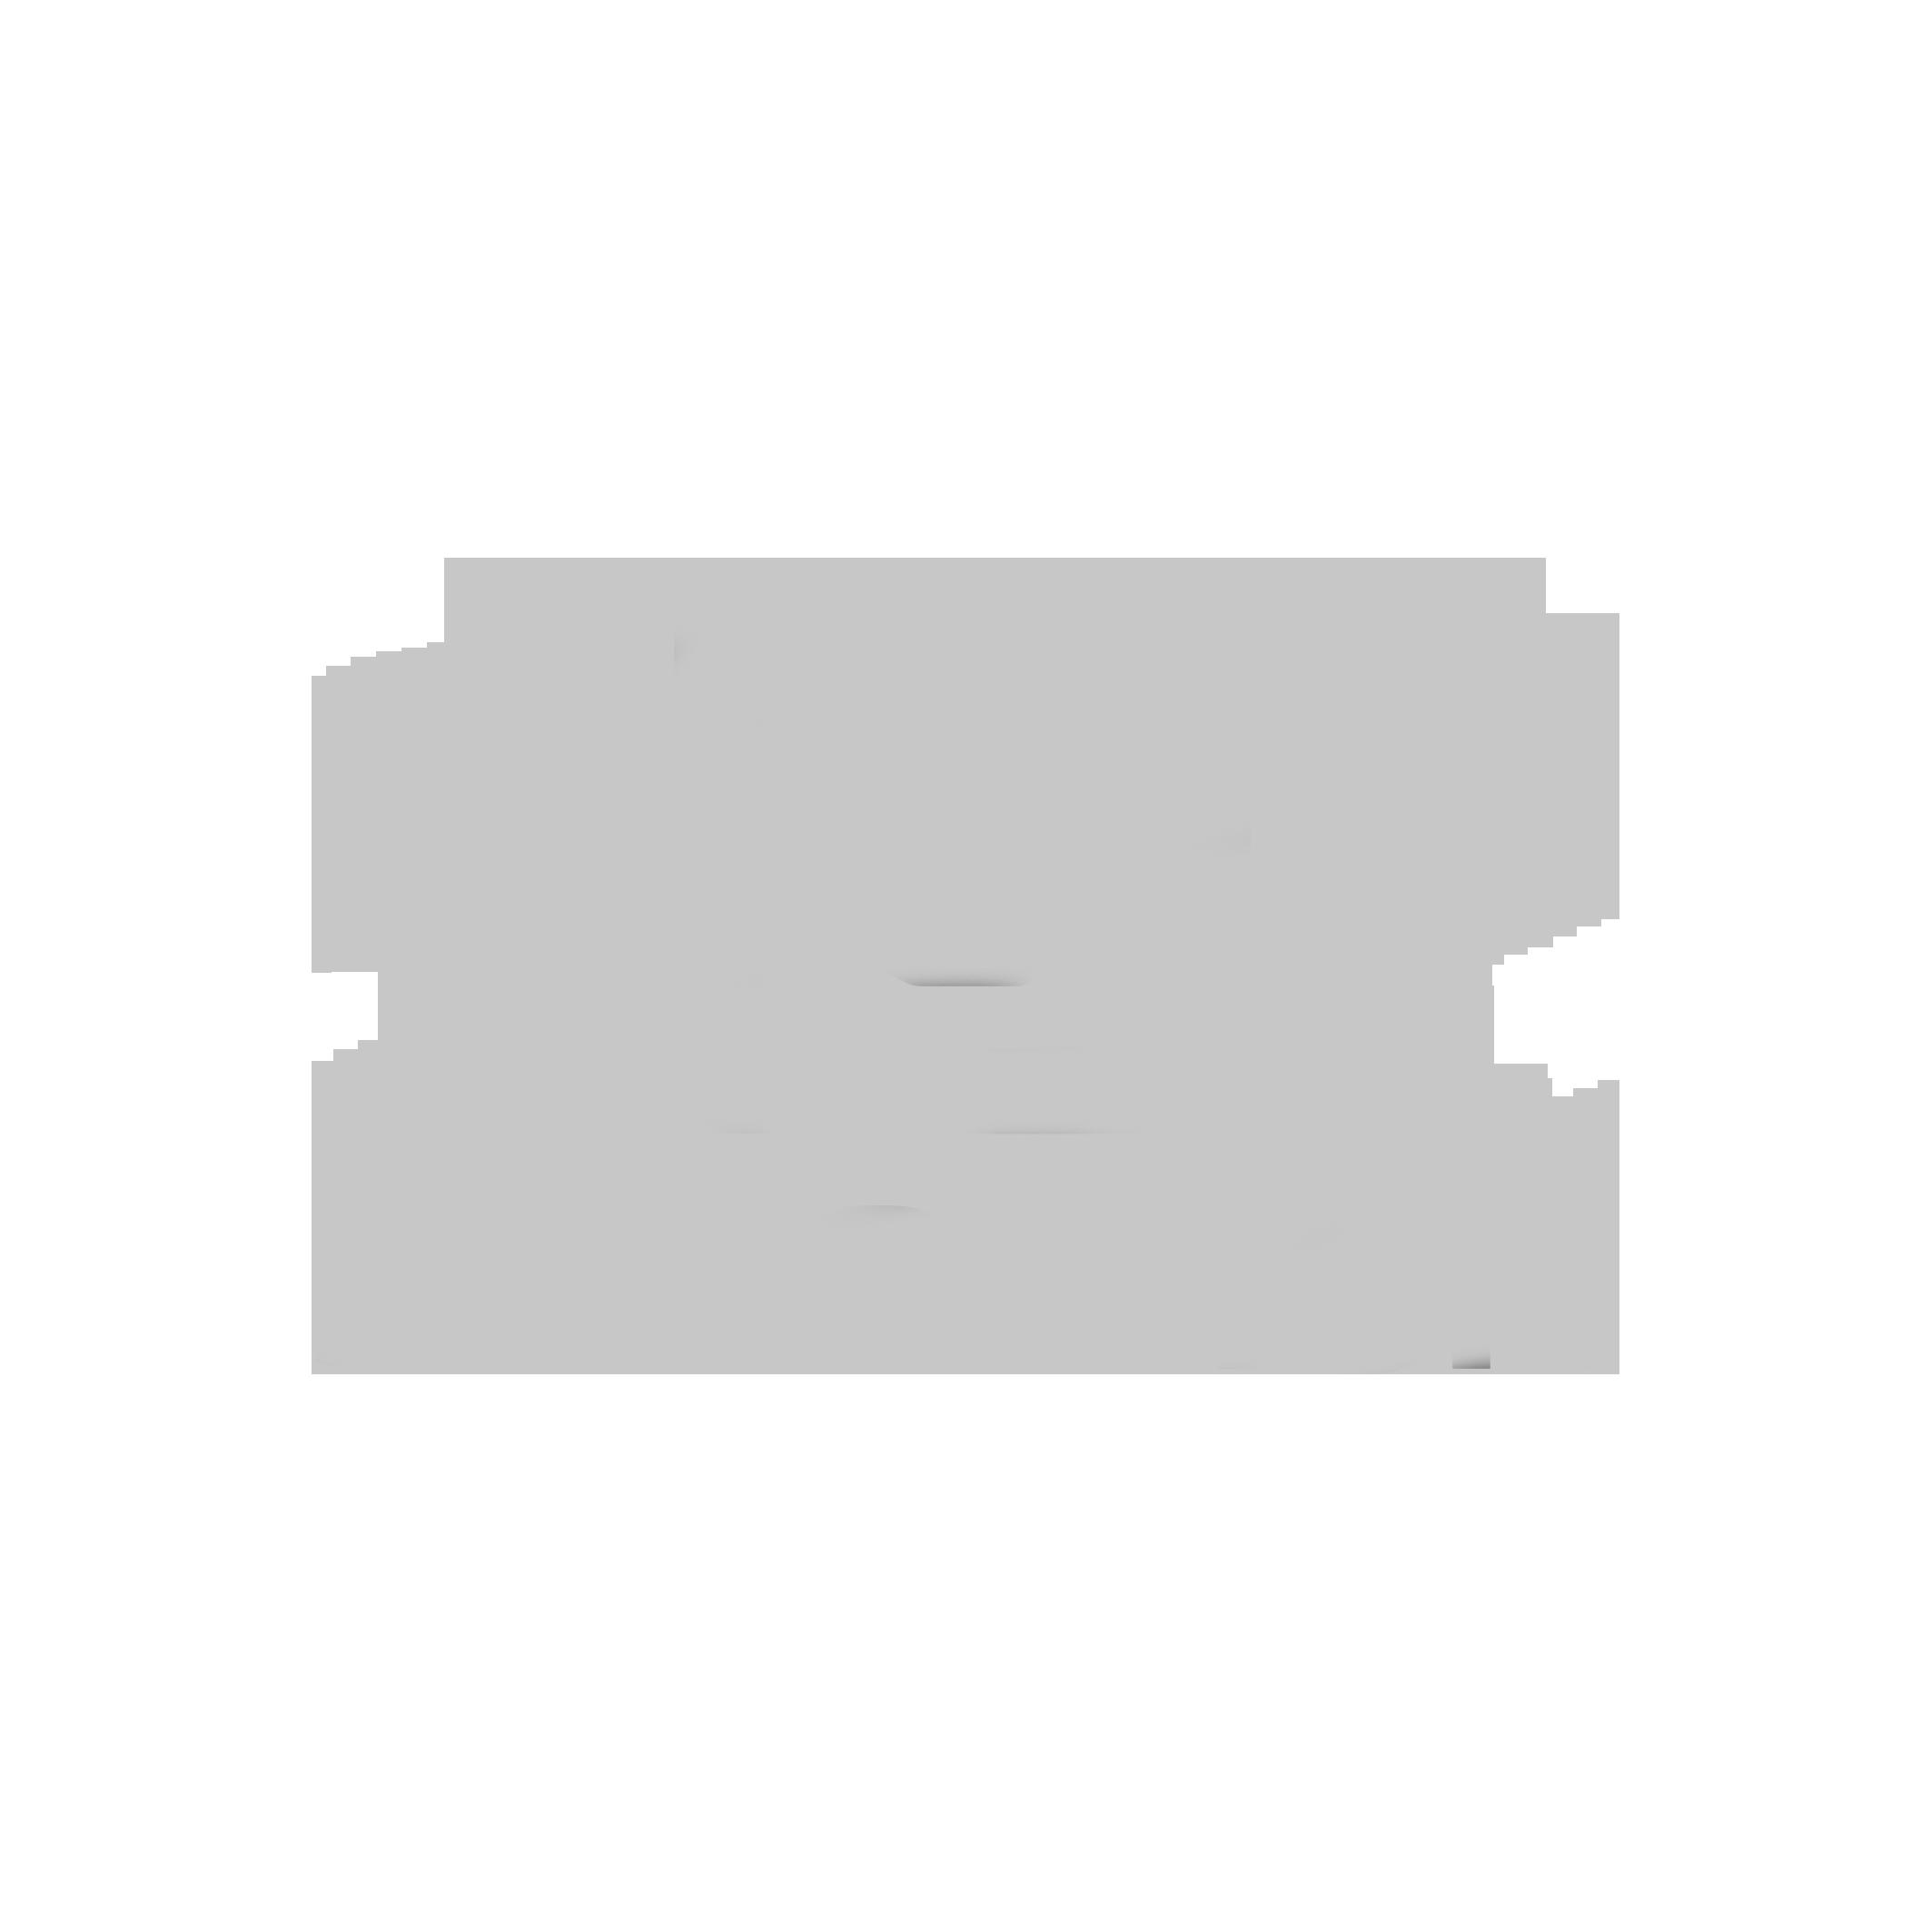 salomon-logo_grey.png